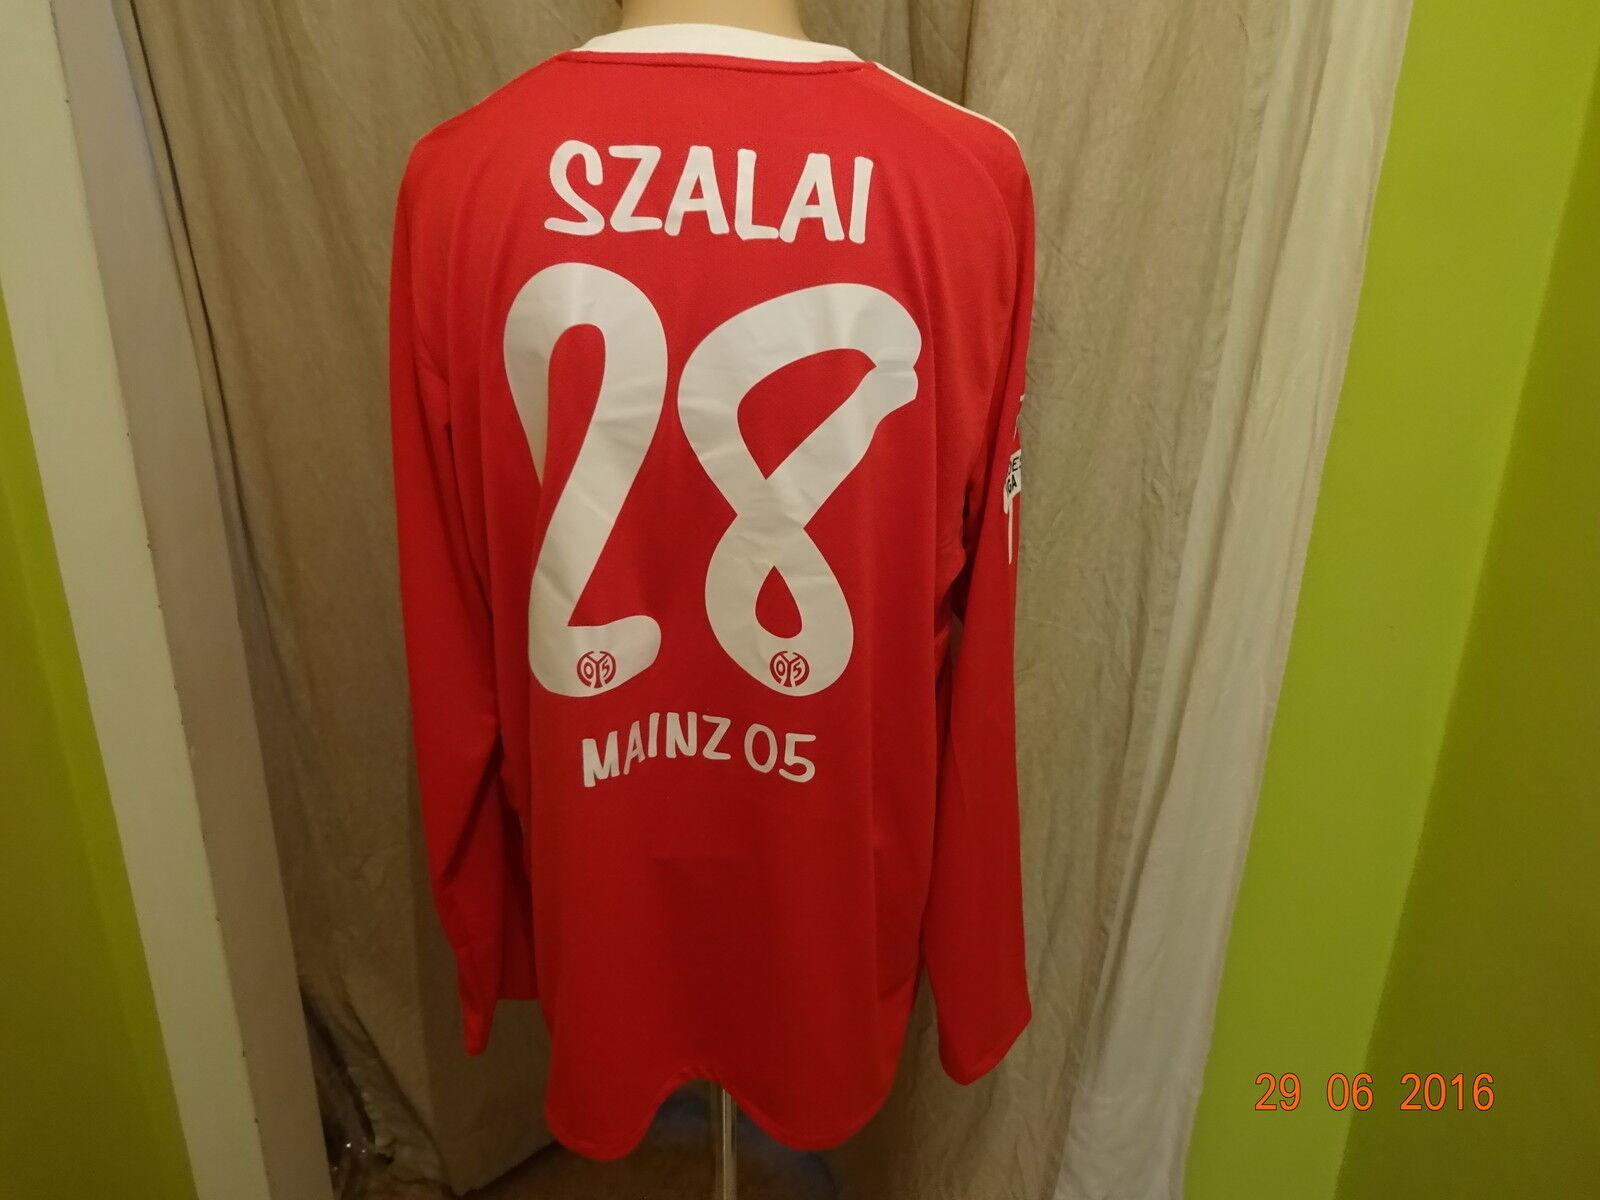 FSV Mainz 05 Nike Langarm Spieler Matchworn Trikot 2010 2010 2010 11 + Nr.28 Szalai Gr.XL 943823